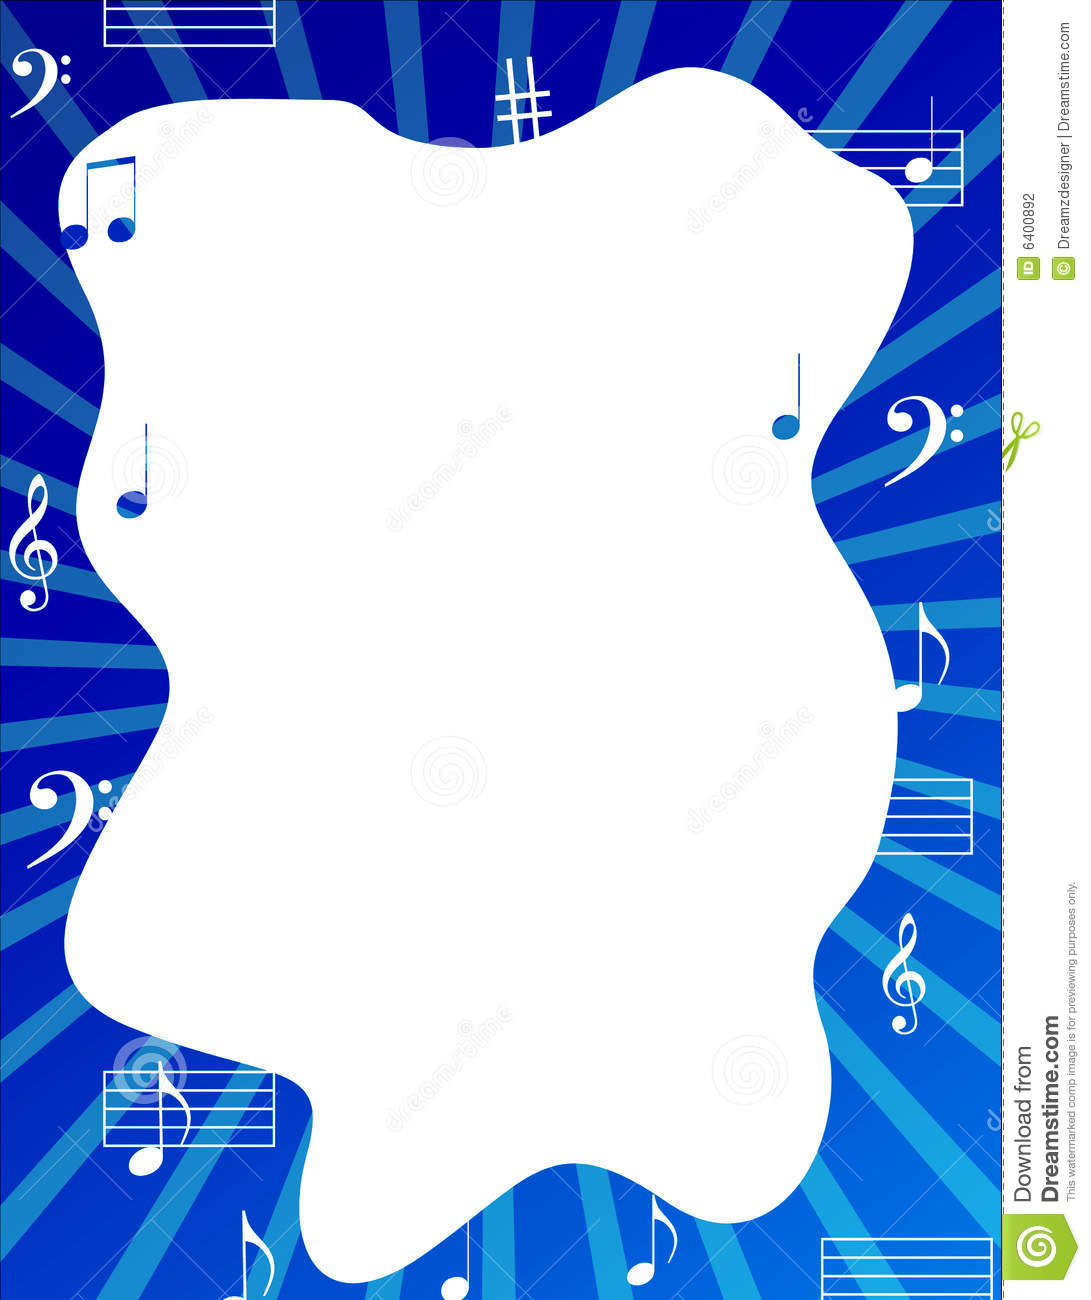 Music note frames